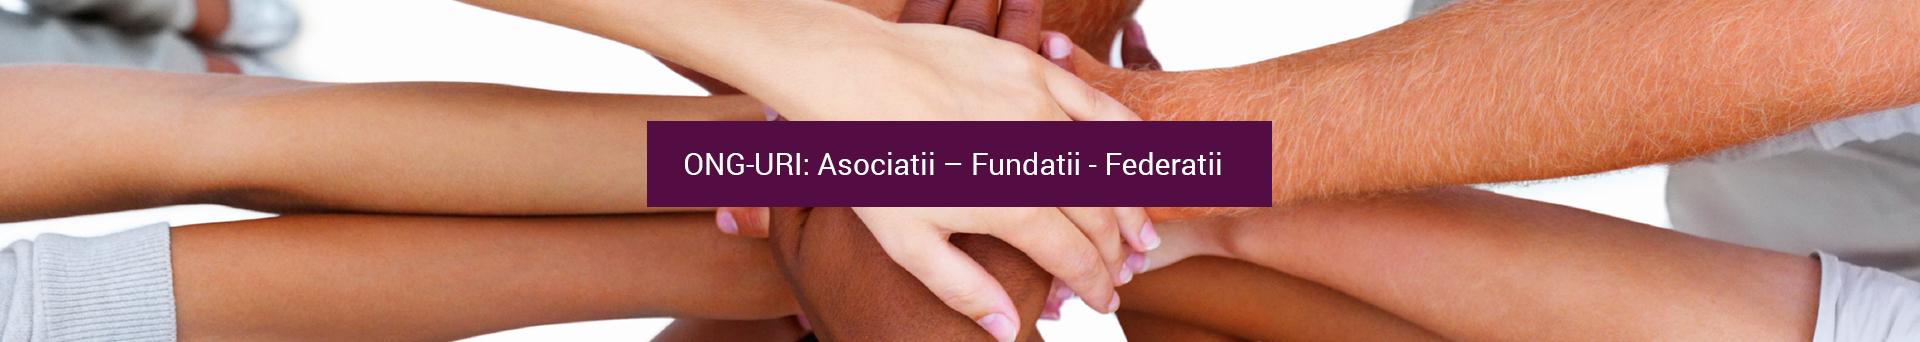 Asociatii – Fundatii - Federatii